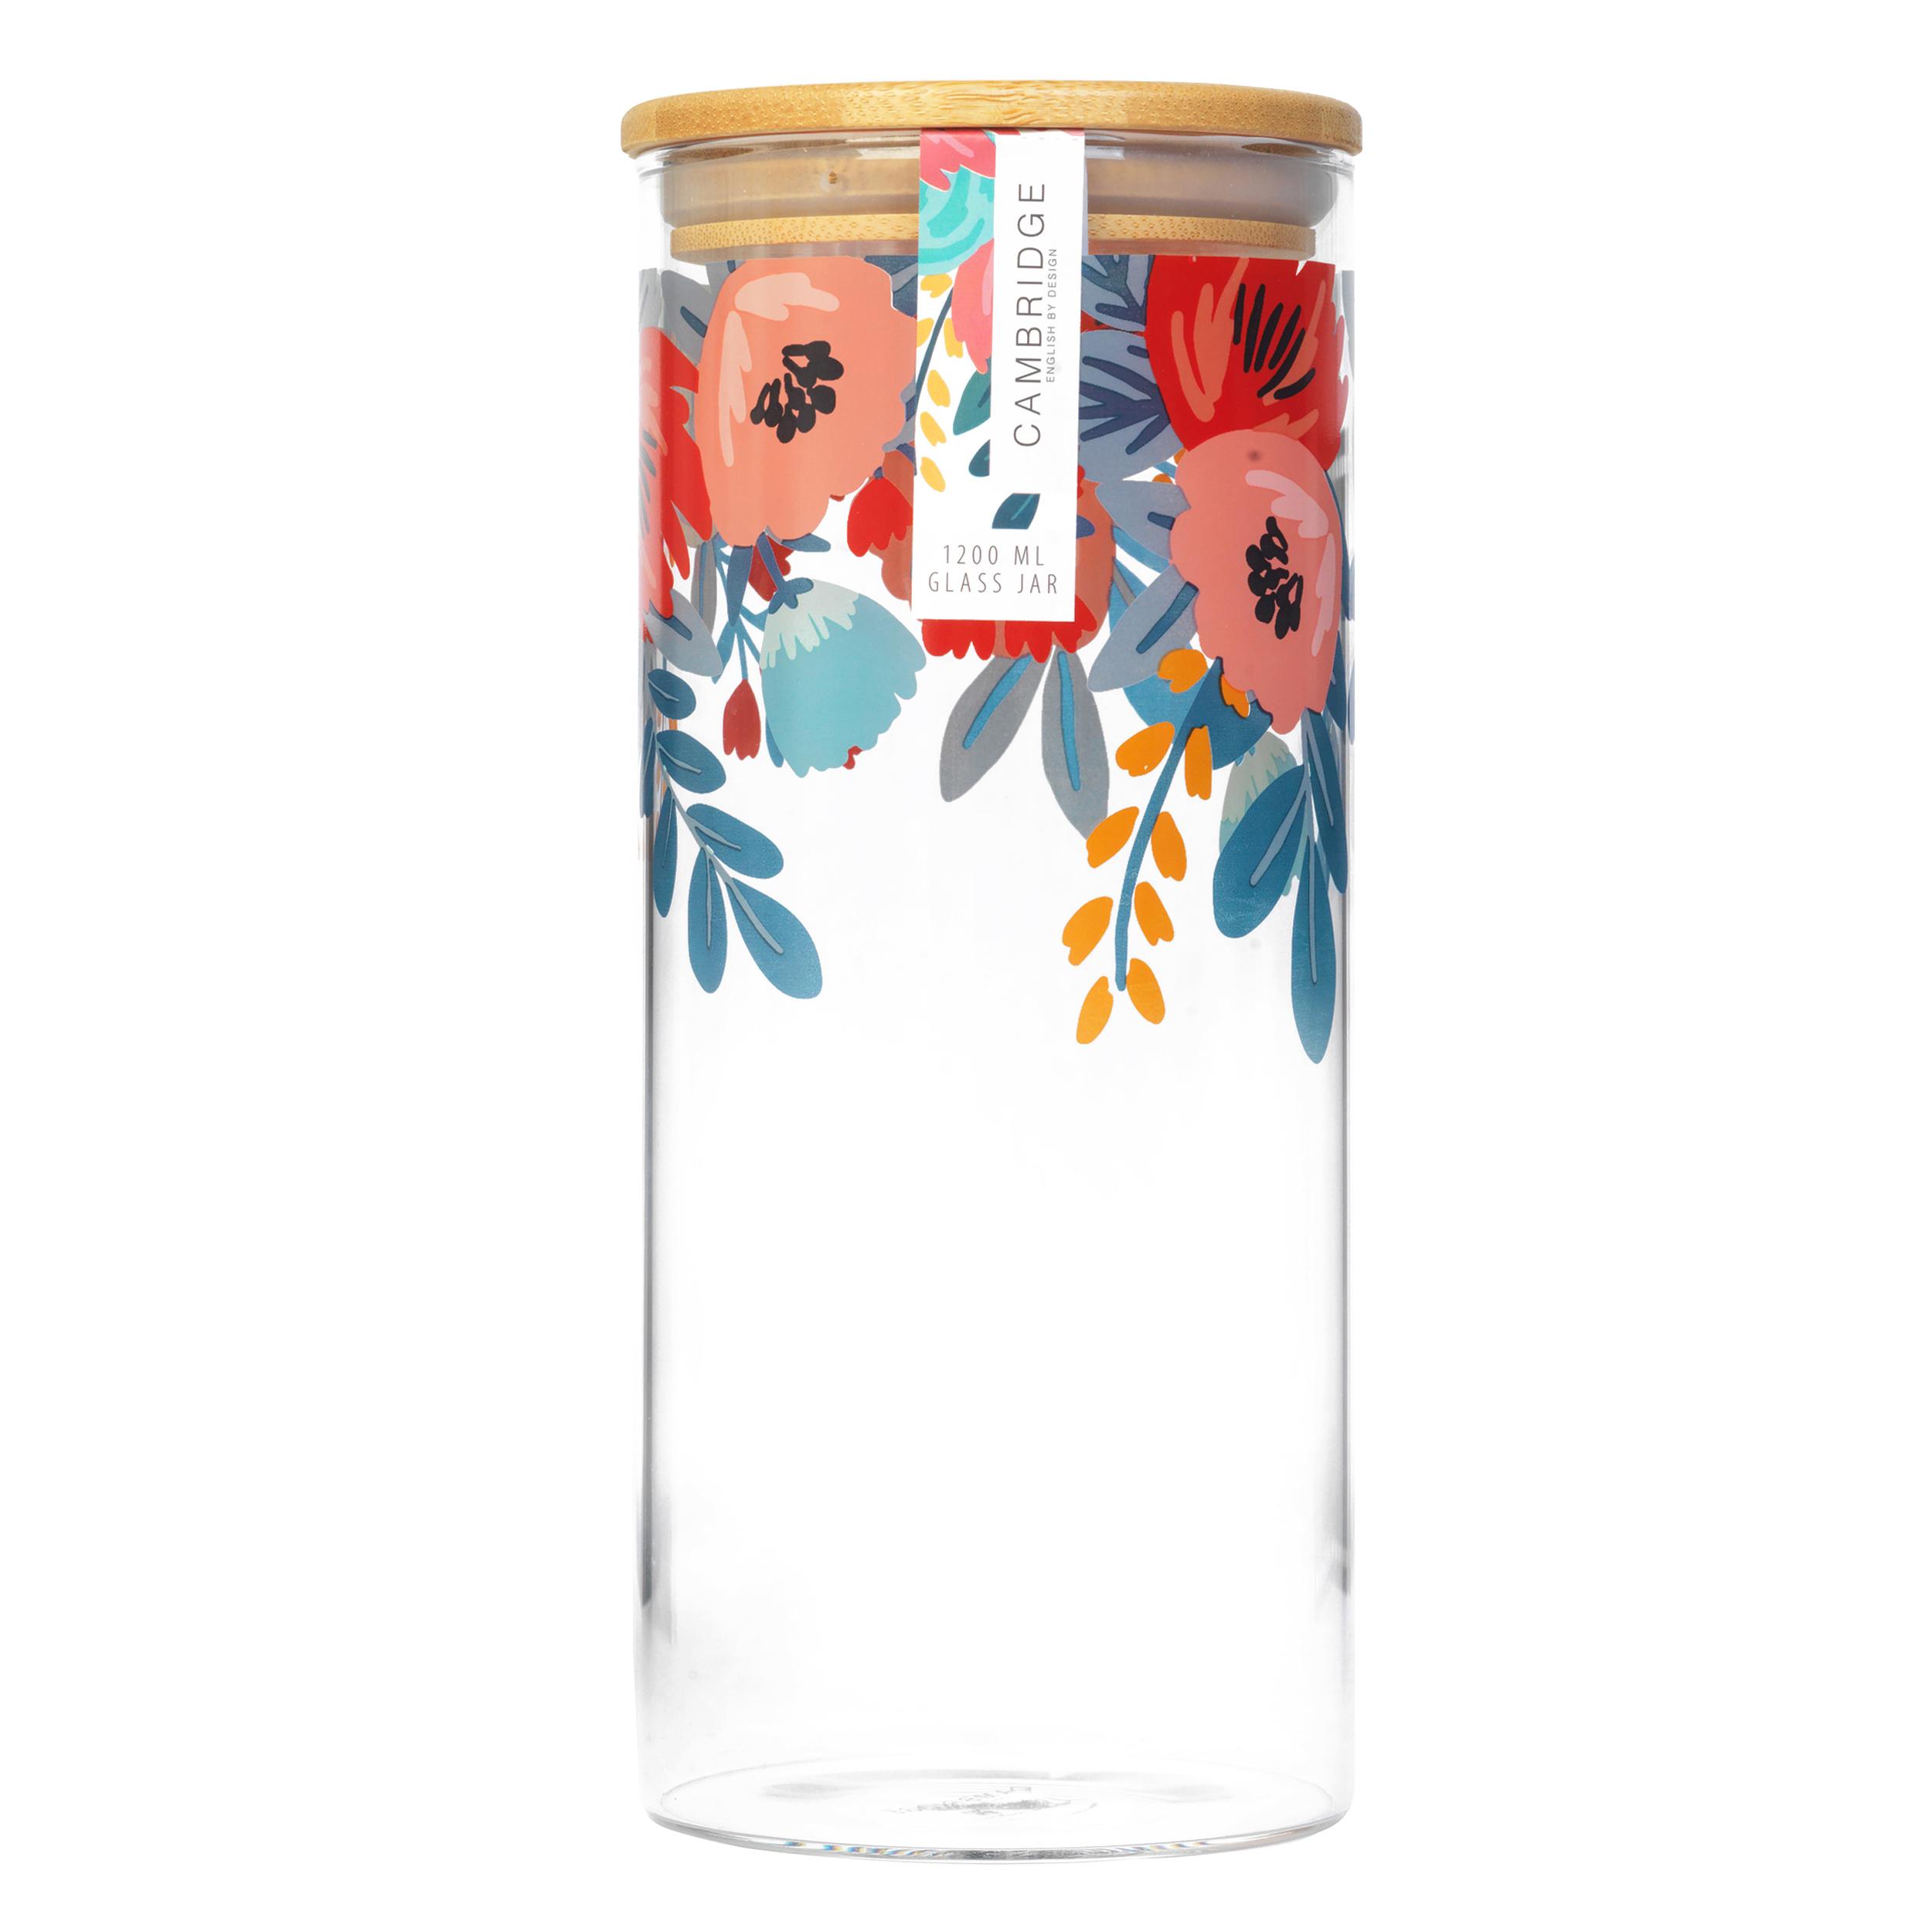 thumbnail 6 - Cambridge® Storage Preserving Glass Jar, 1200 ml, Spring Meadow/Doodle/Arielle